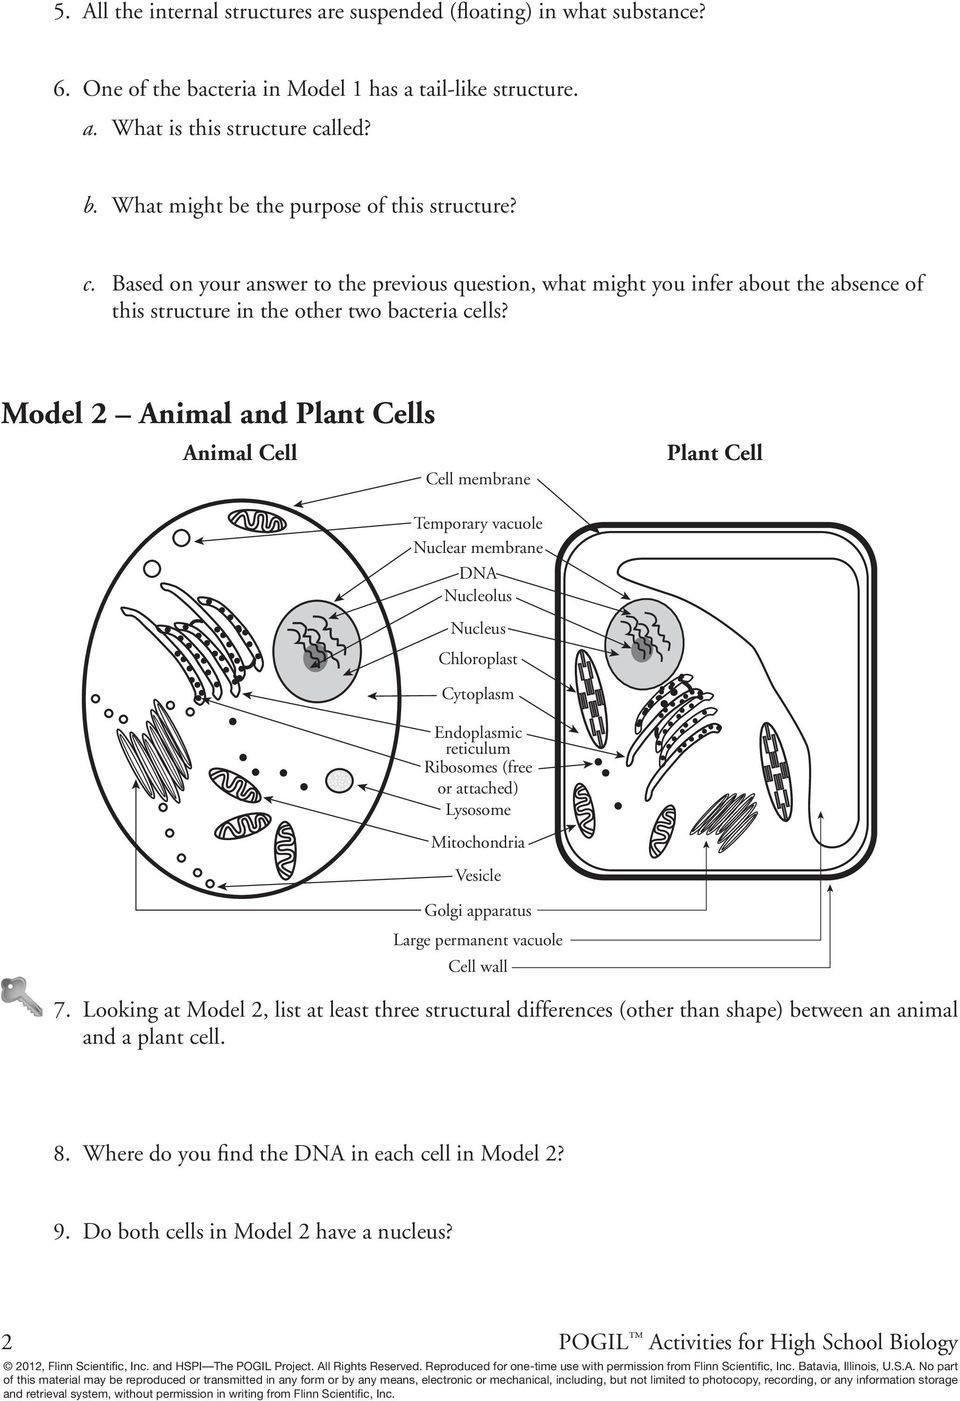 Prokaryotes Vs Eukaryotes Worksheet Cell Biology Prokaryotes and Eukaryotes Worksheet Answers